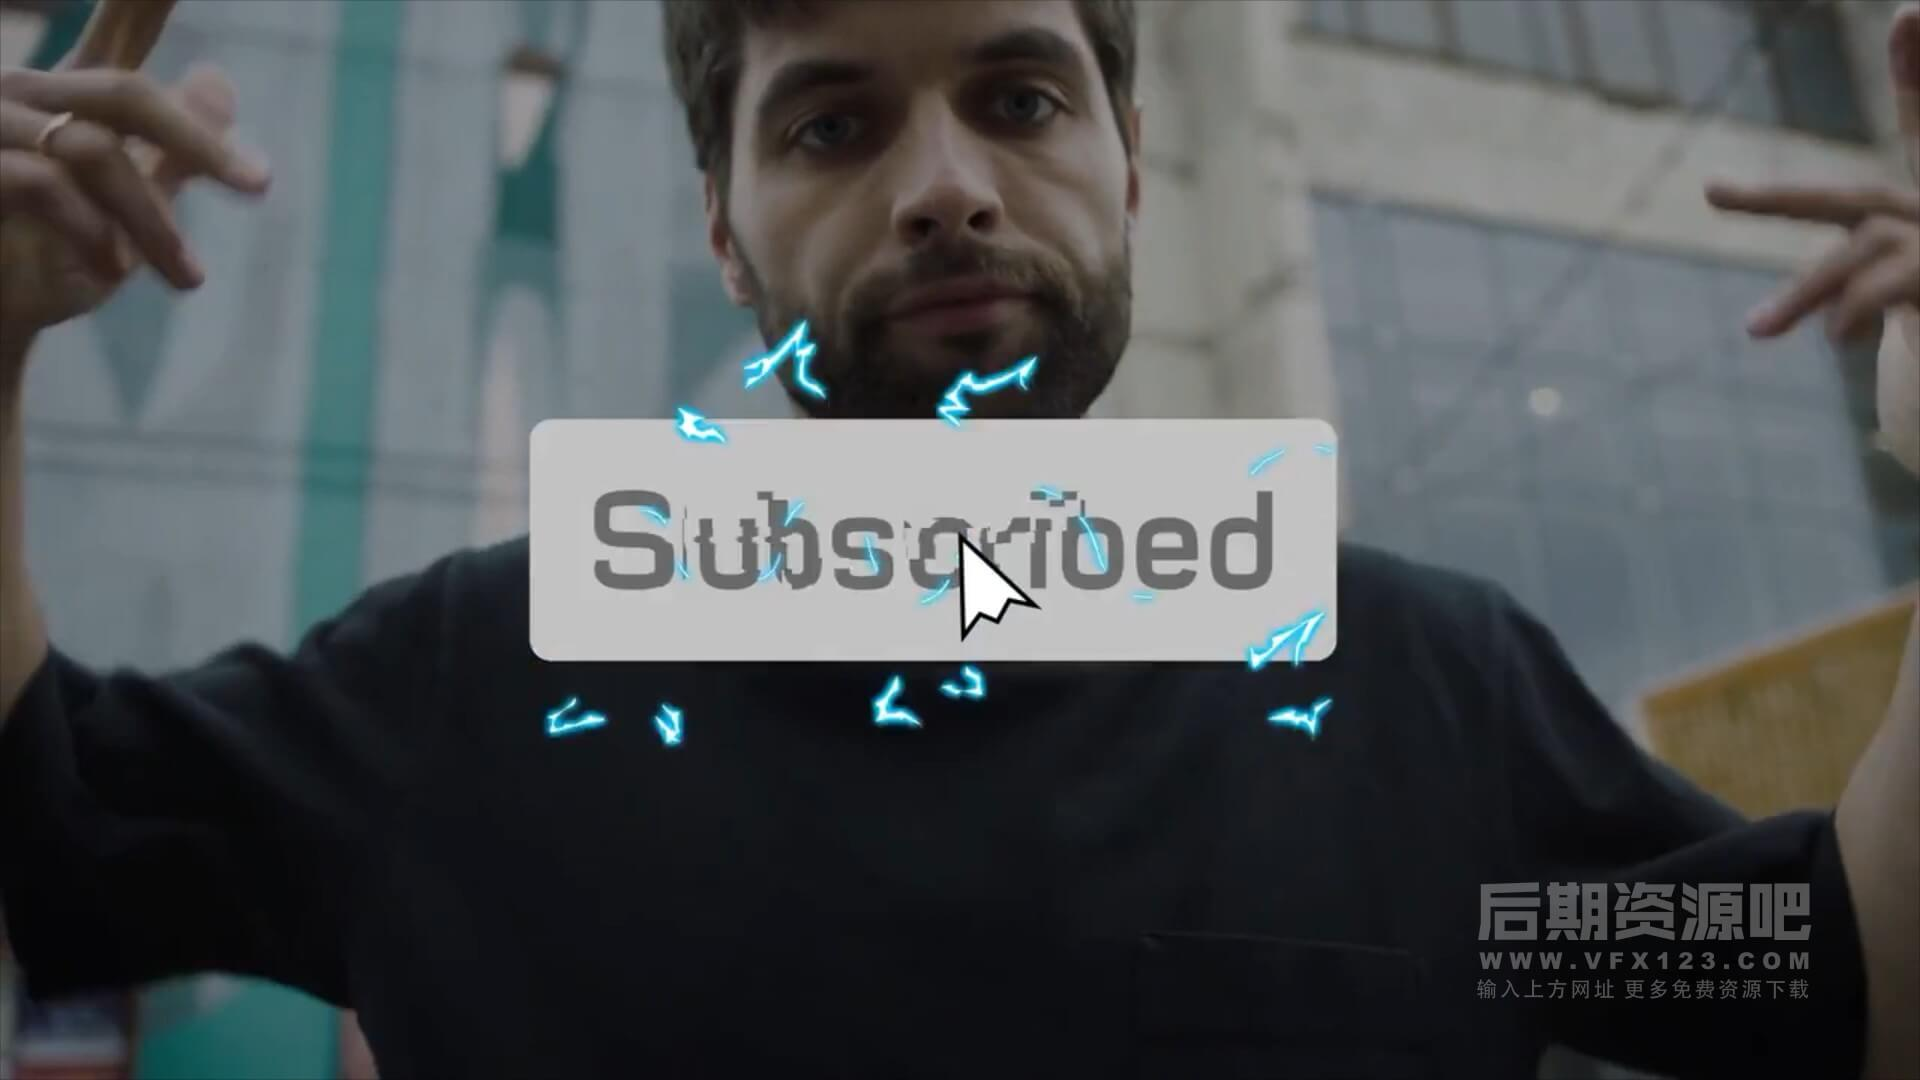 Fcpx插件 博主UP主卡通订阅按钮动画模板 第一季 Subscribe Buttons